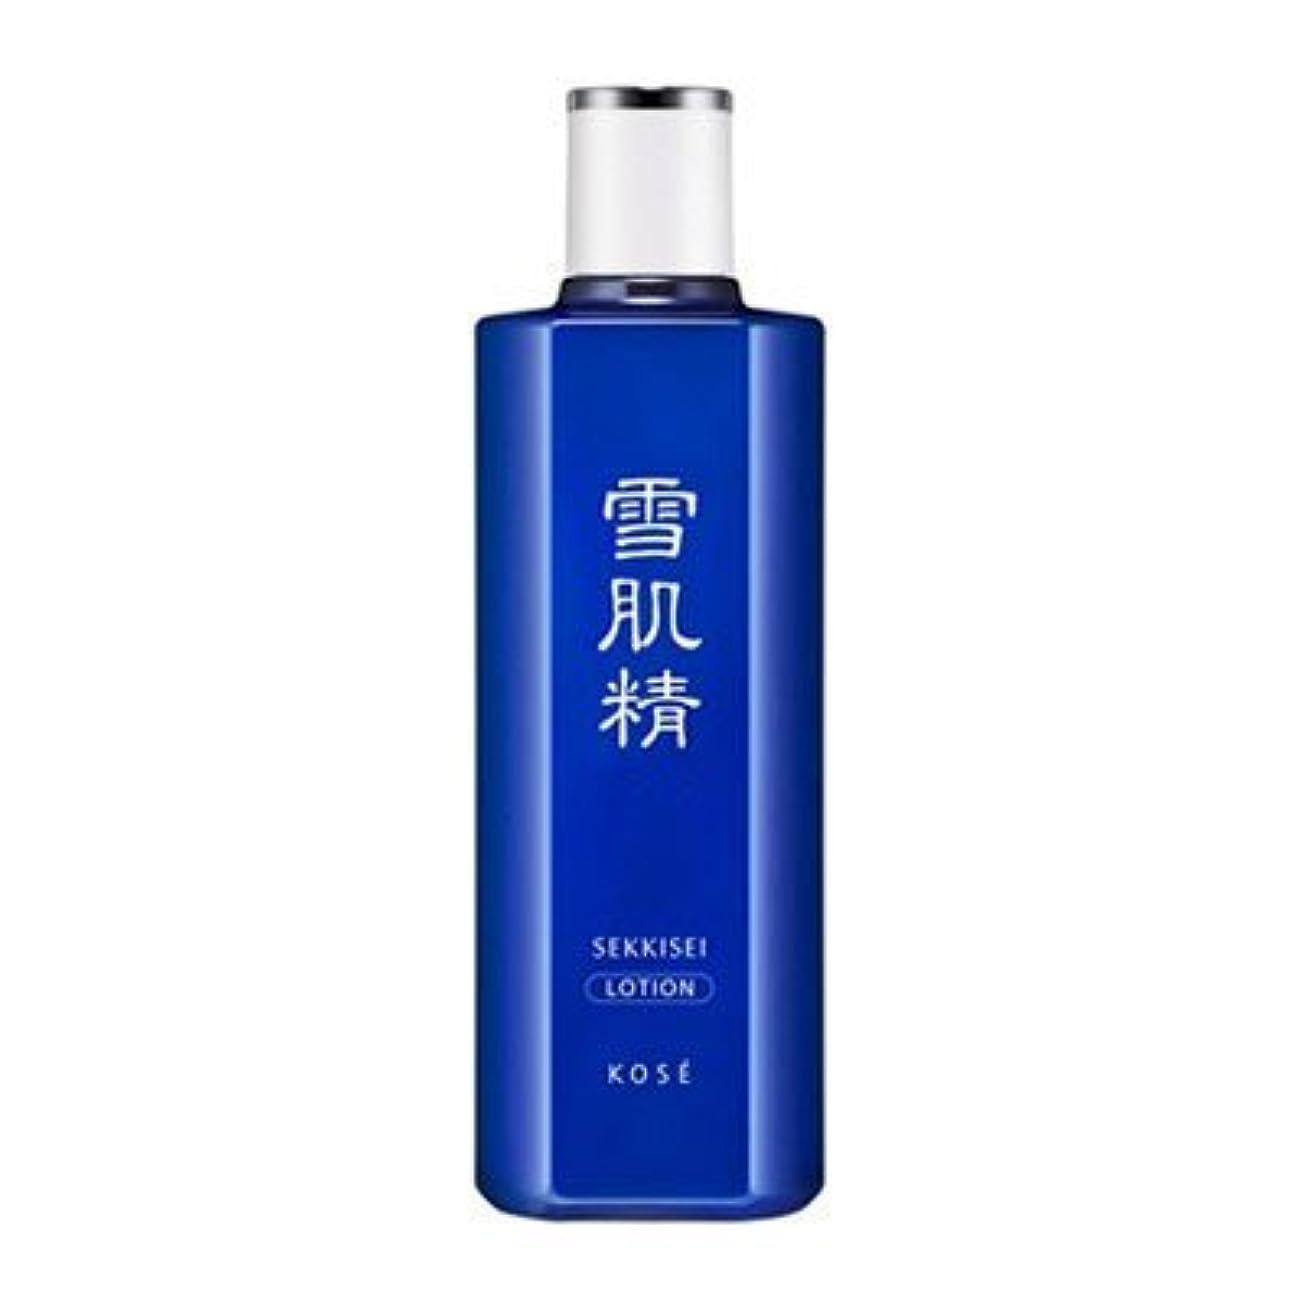 KOSE コーセー 薬用 雪肌精 360ml [並行輸入品]